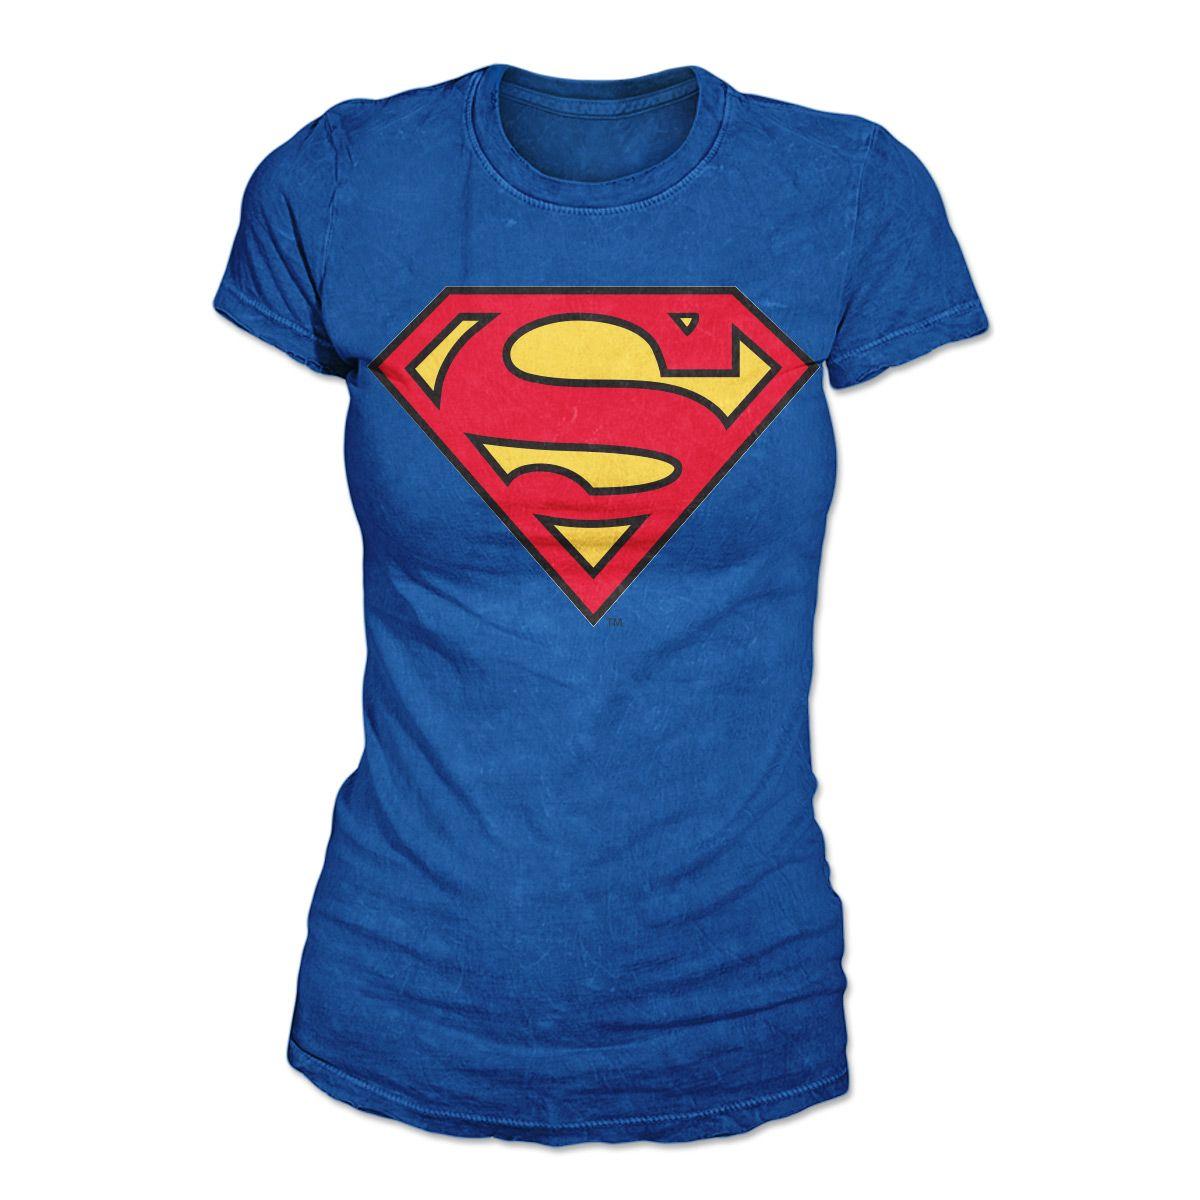 929184ebe Camiseta Feminina Superman - Logo Supergirl Oficial